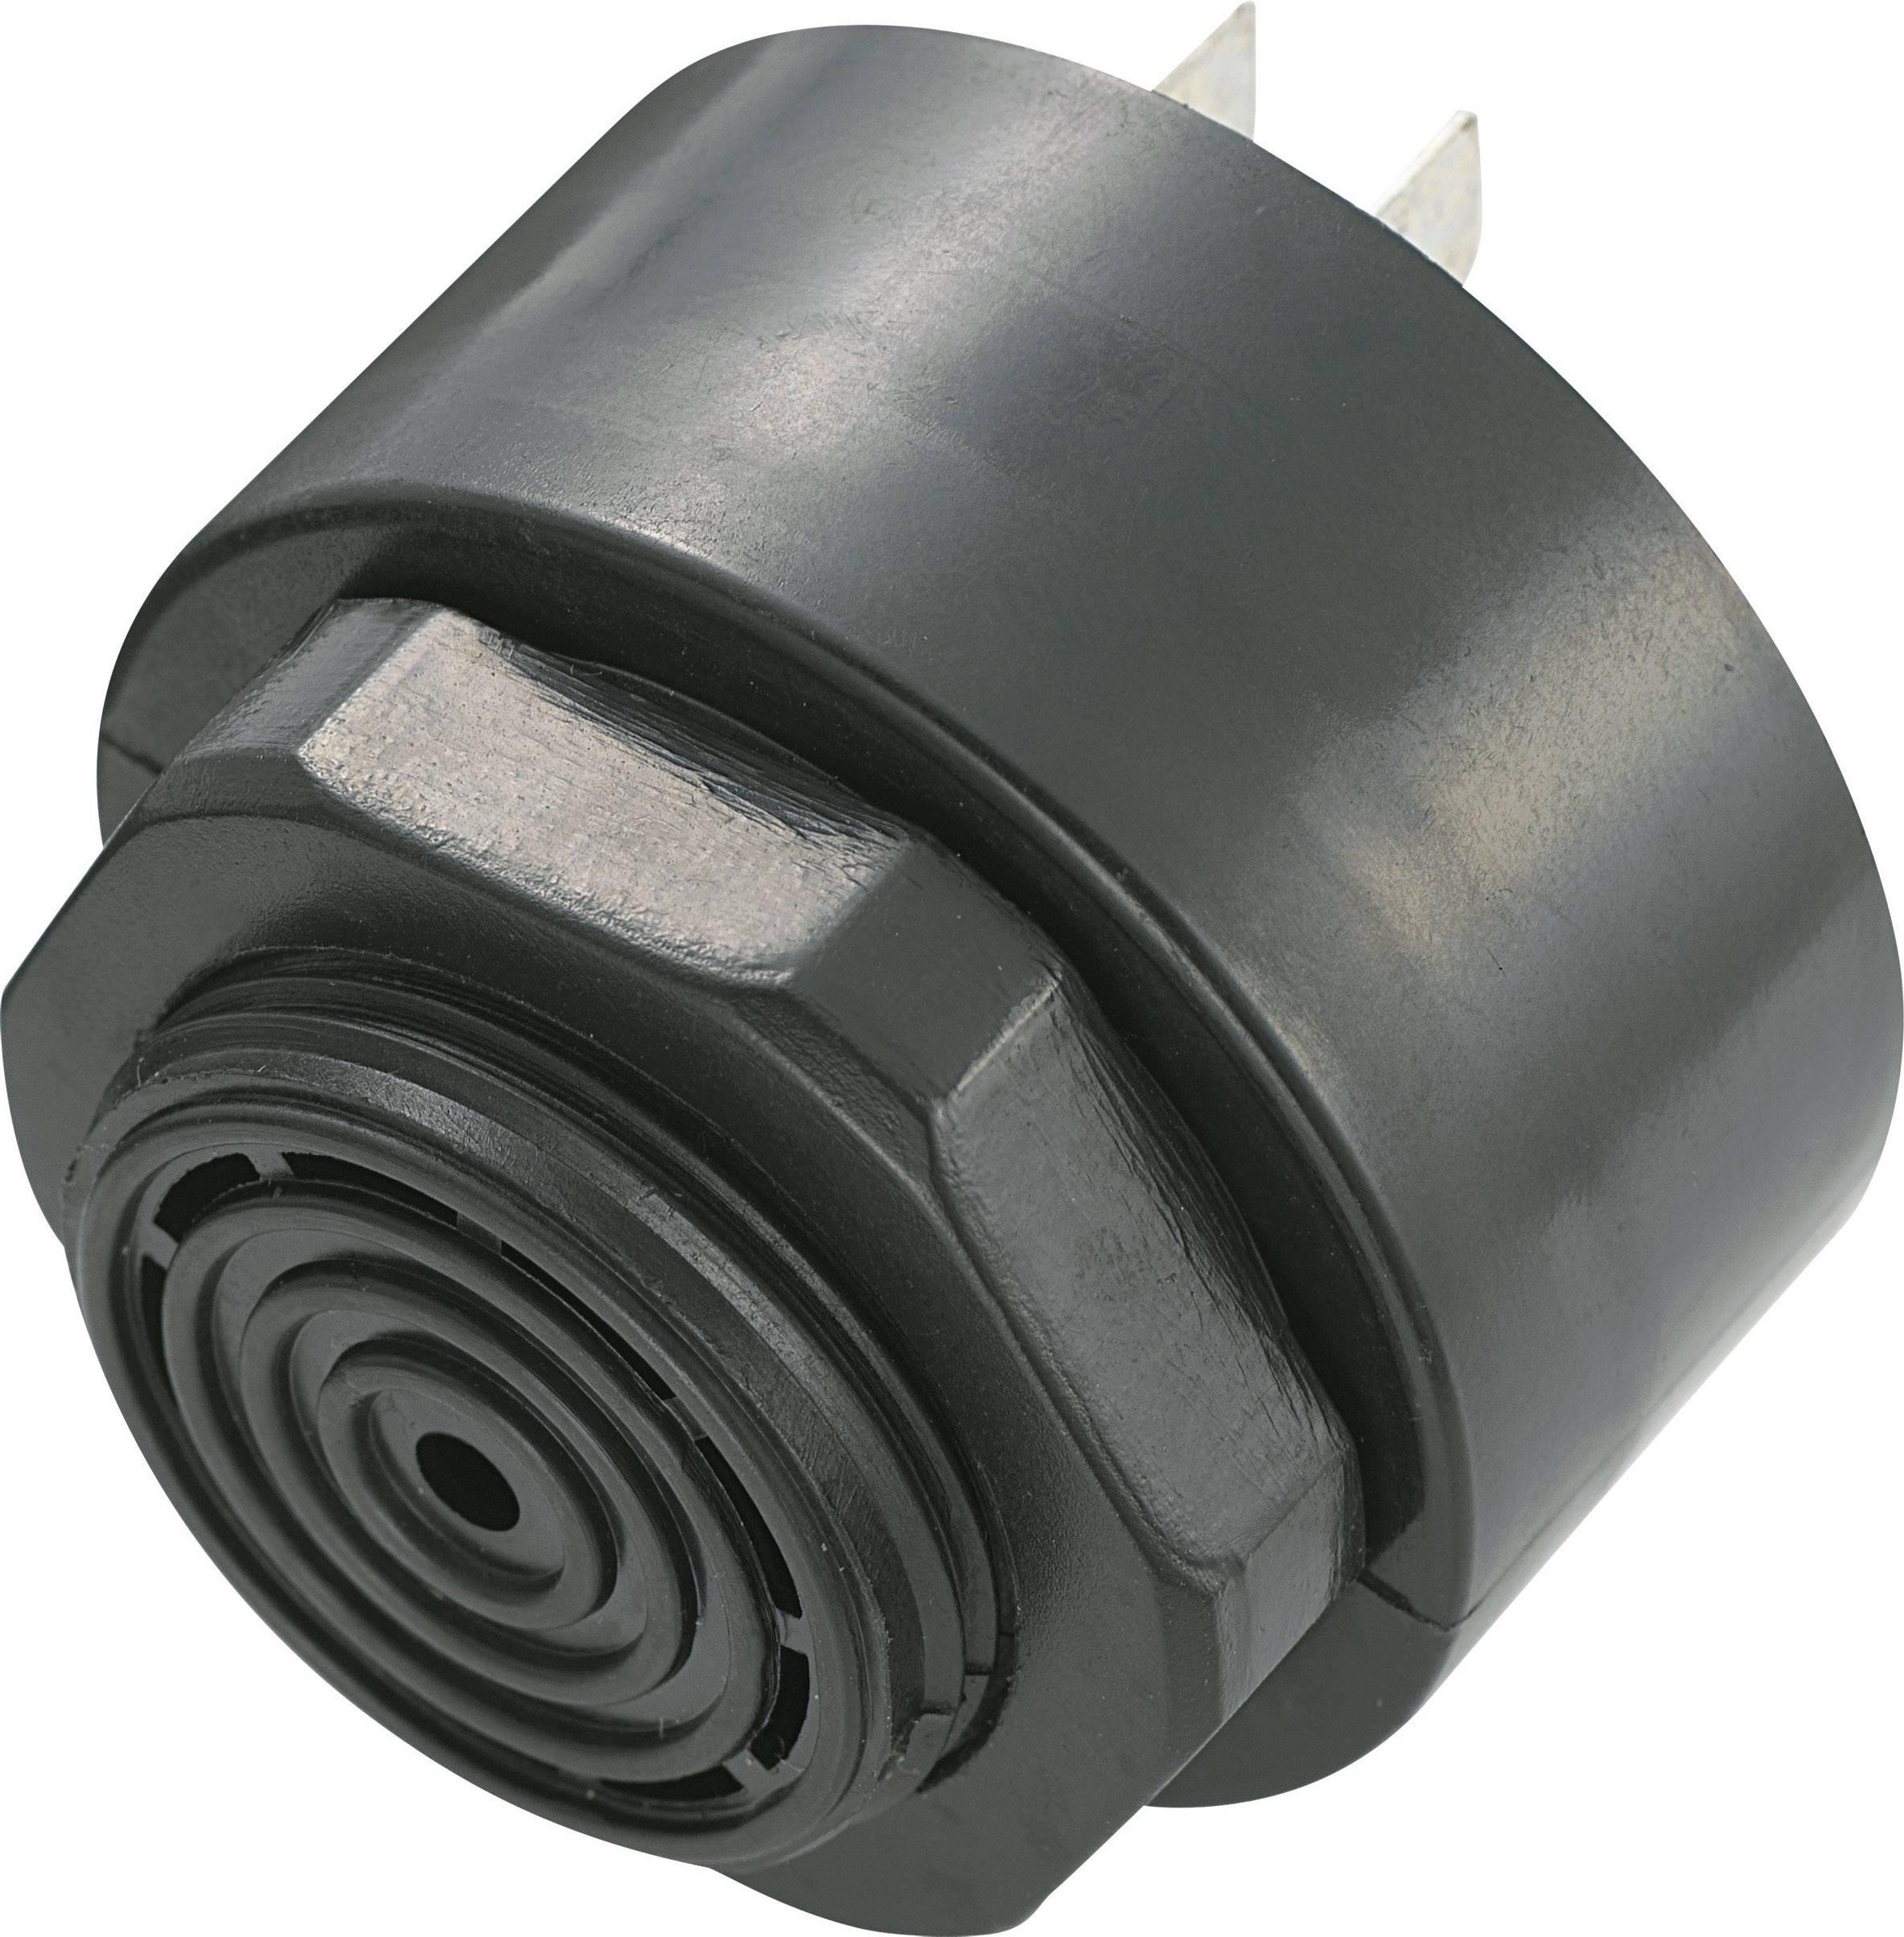 TRU COMPONENTS TC-1578956 Signalgeber Geräusch-Entwicklung 70 dB  Spannung 230